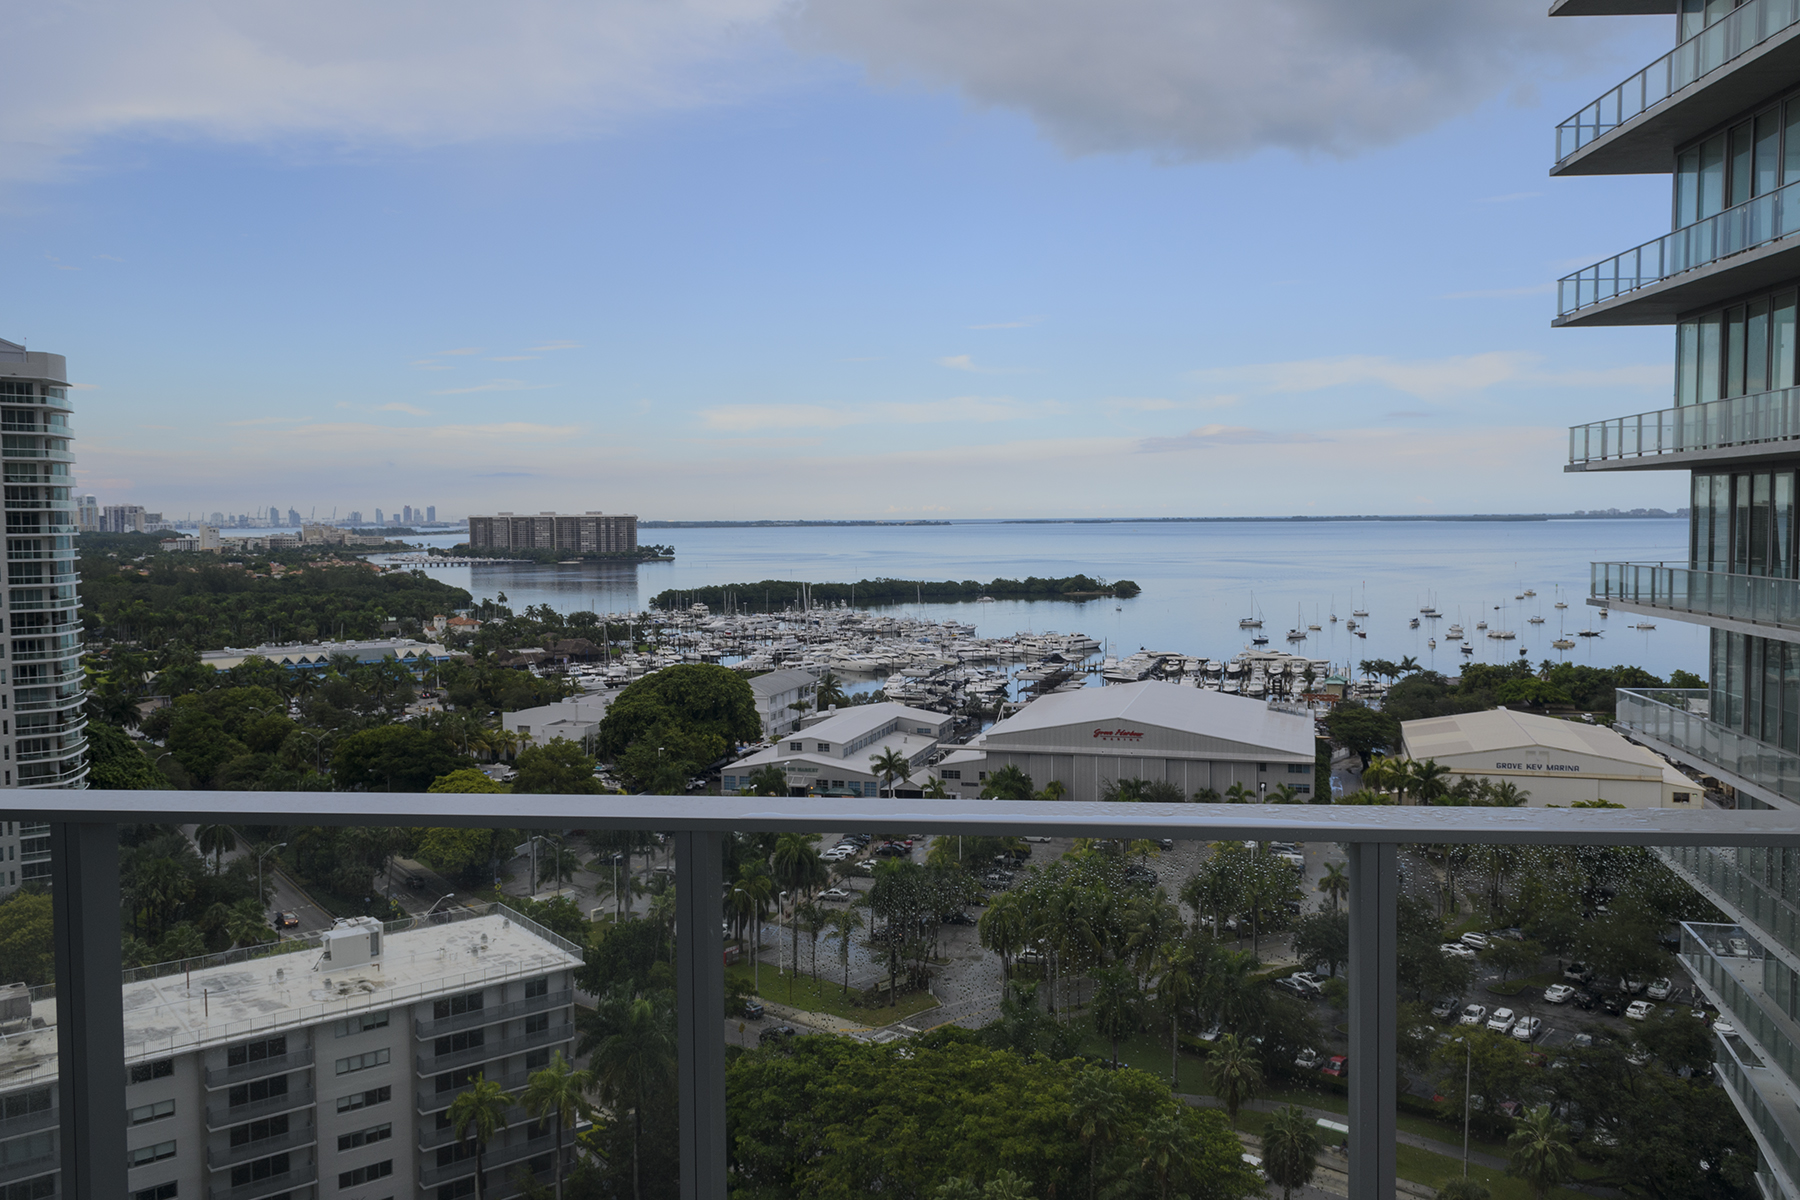 Condominium for Sale at 2669 S Bayshore Drive #1401-N 2669 S Bayshore Drive 1401-N Miami, Florida, 33133 United States